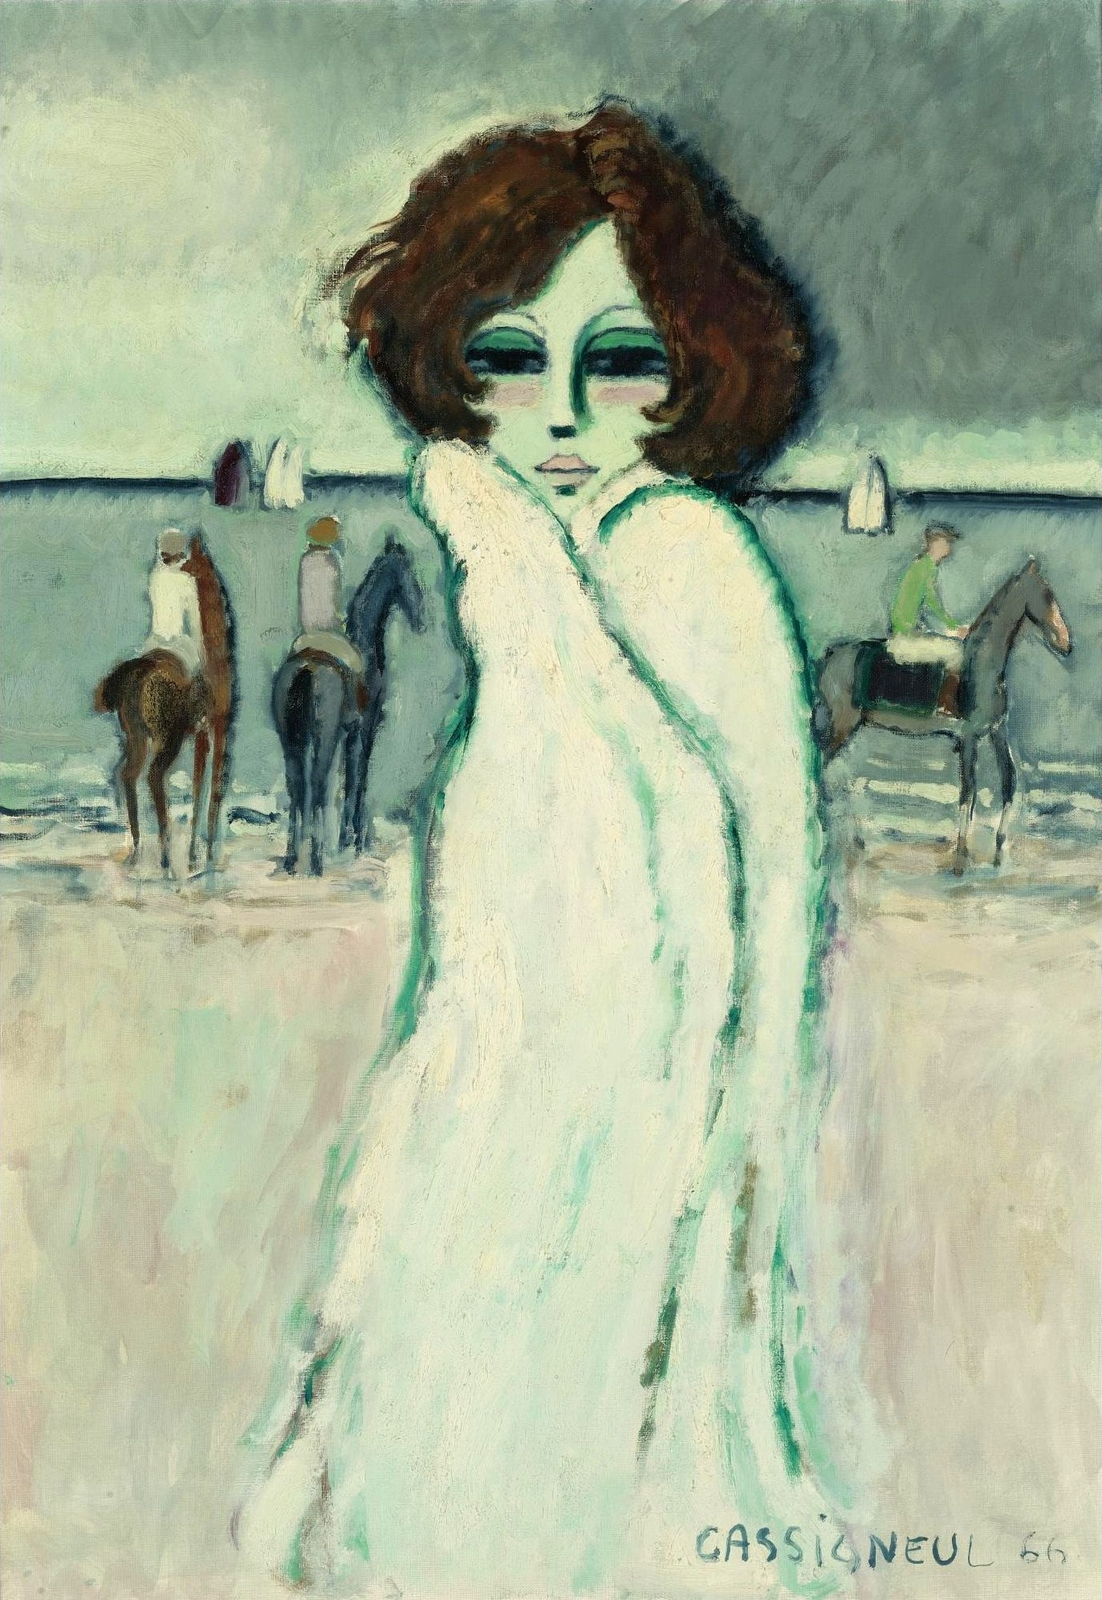 1966_Женщина на пляже (Femme sur la plage)_92.5 х 64.9_х.,м._Частное собрание.jpg